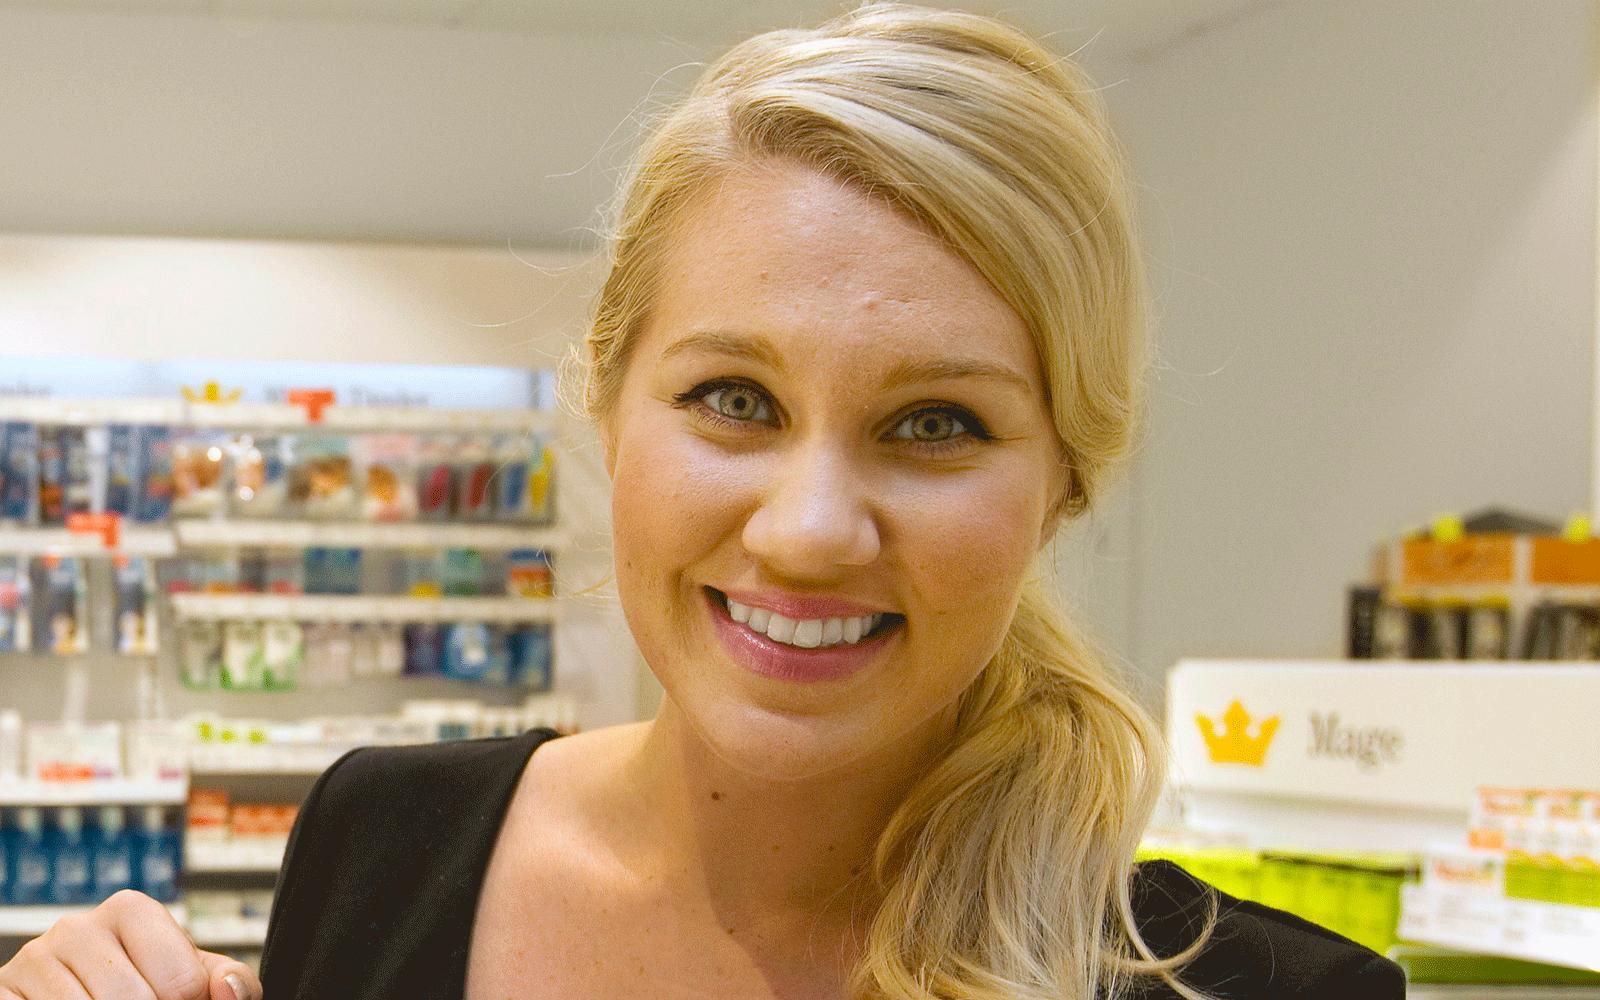 kreditkort ledsagare blond i Örebro